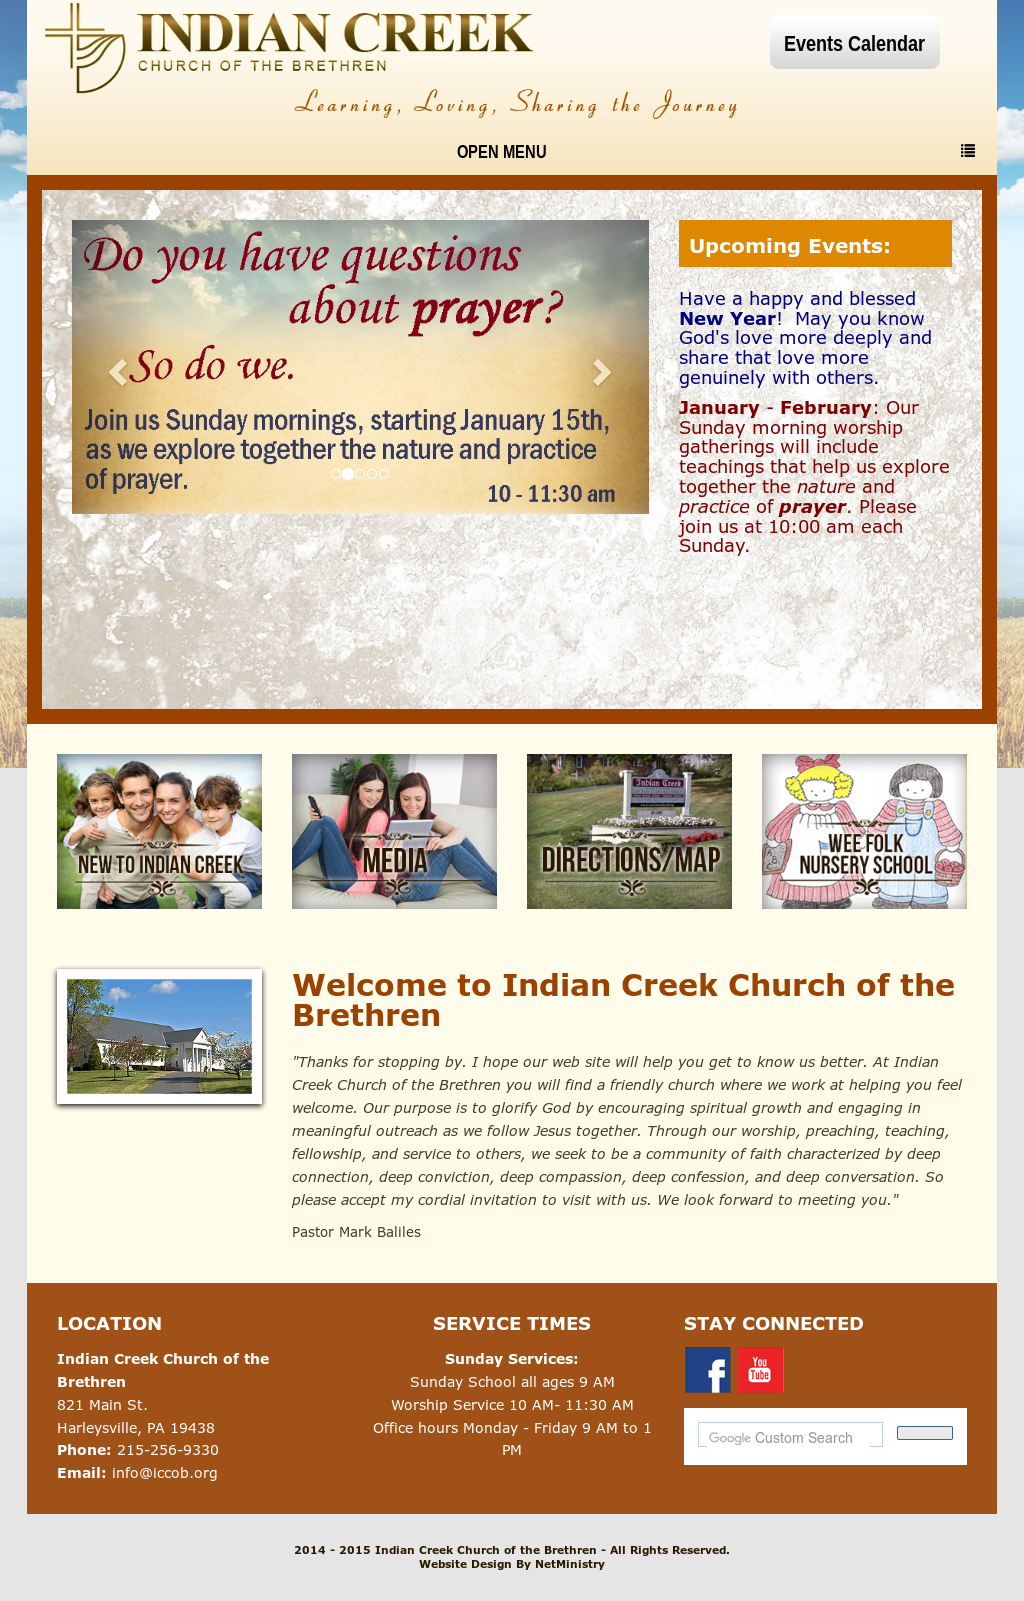 Indian Creek Church Of The Brethren Competitors, Revenue and